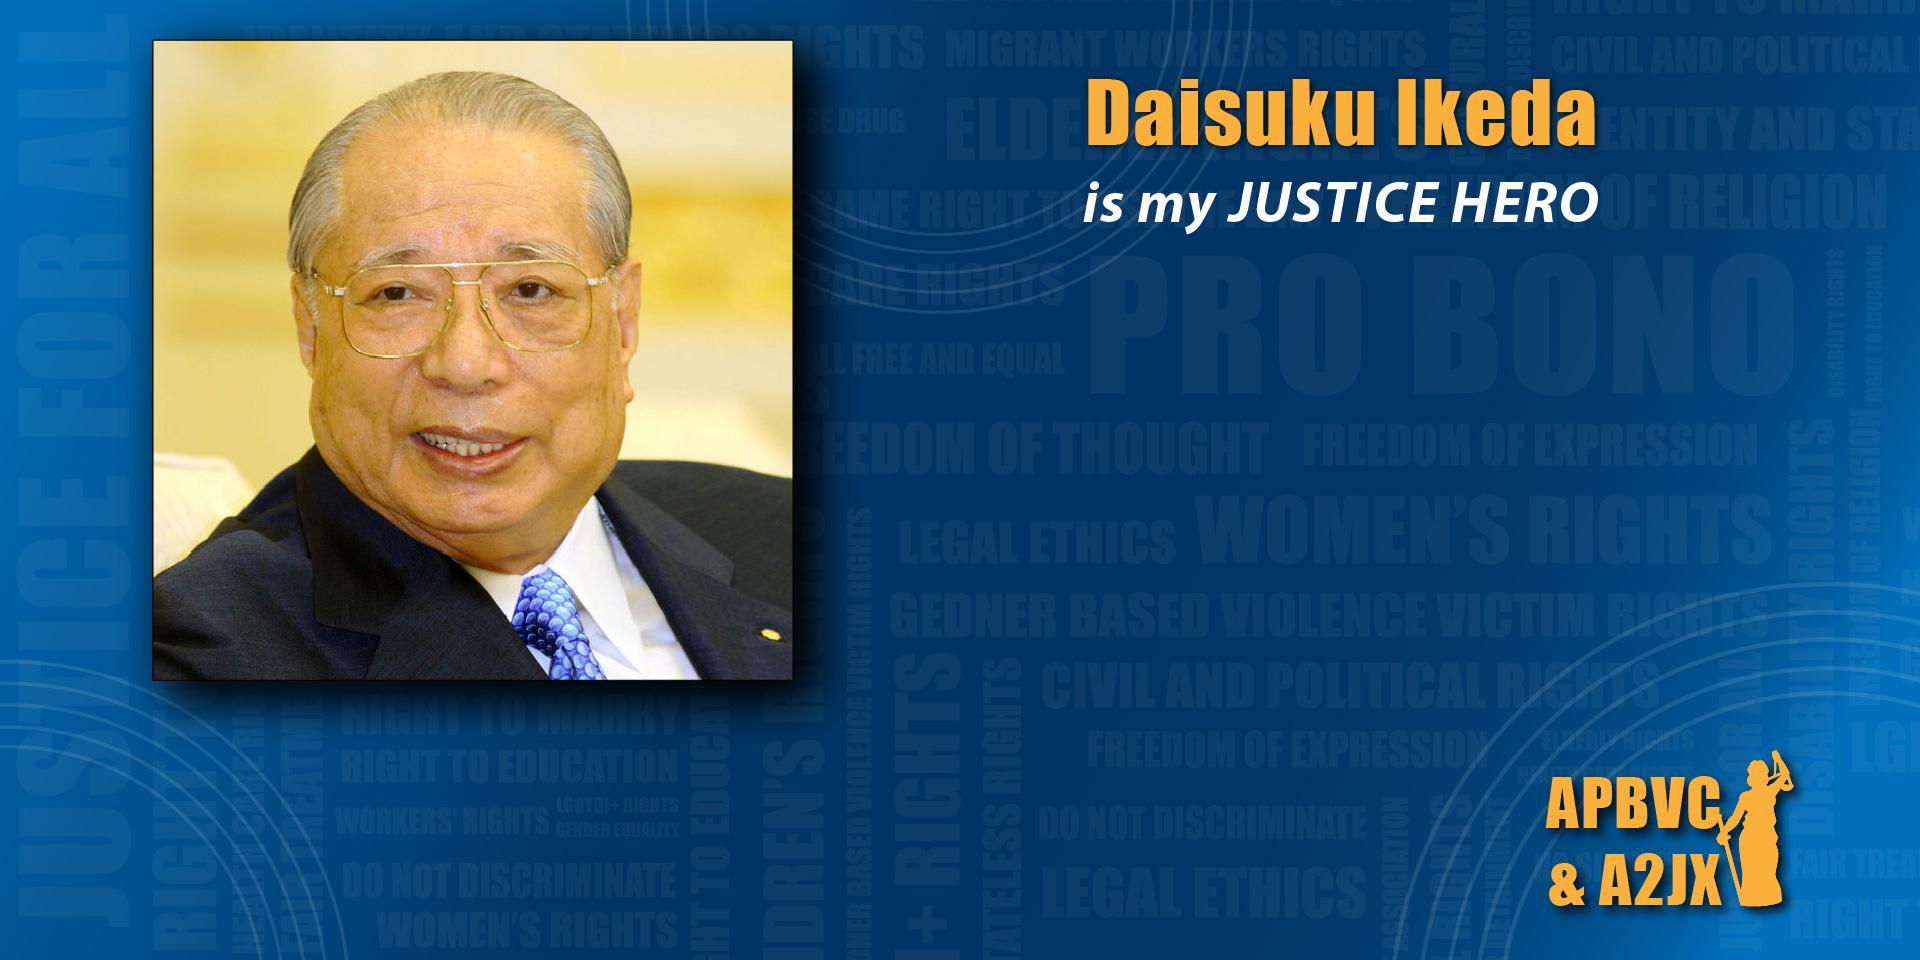 Daisuku Ikeda